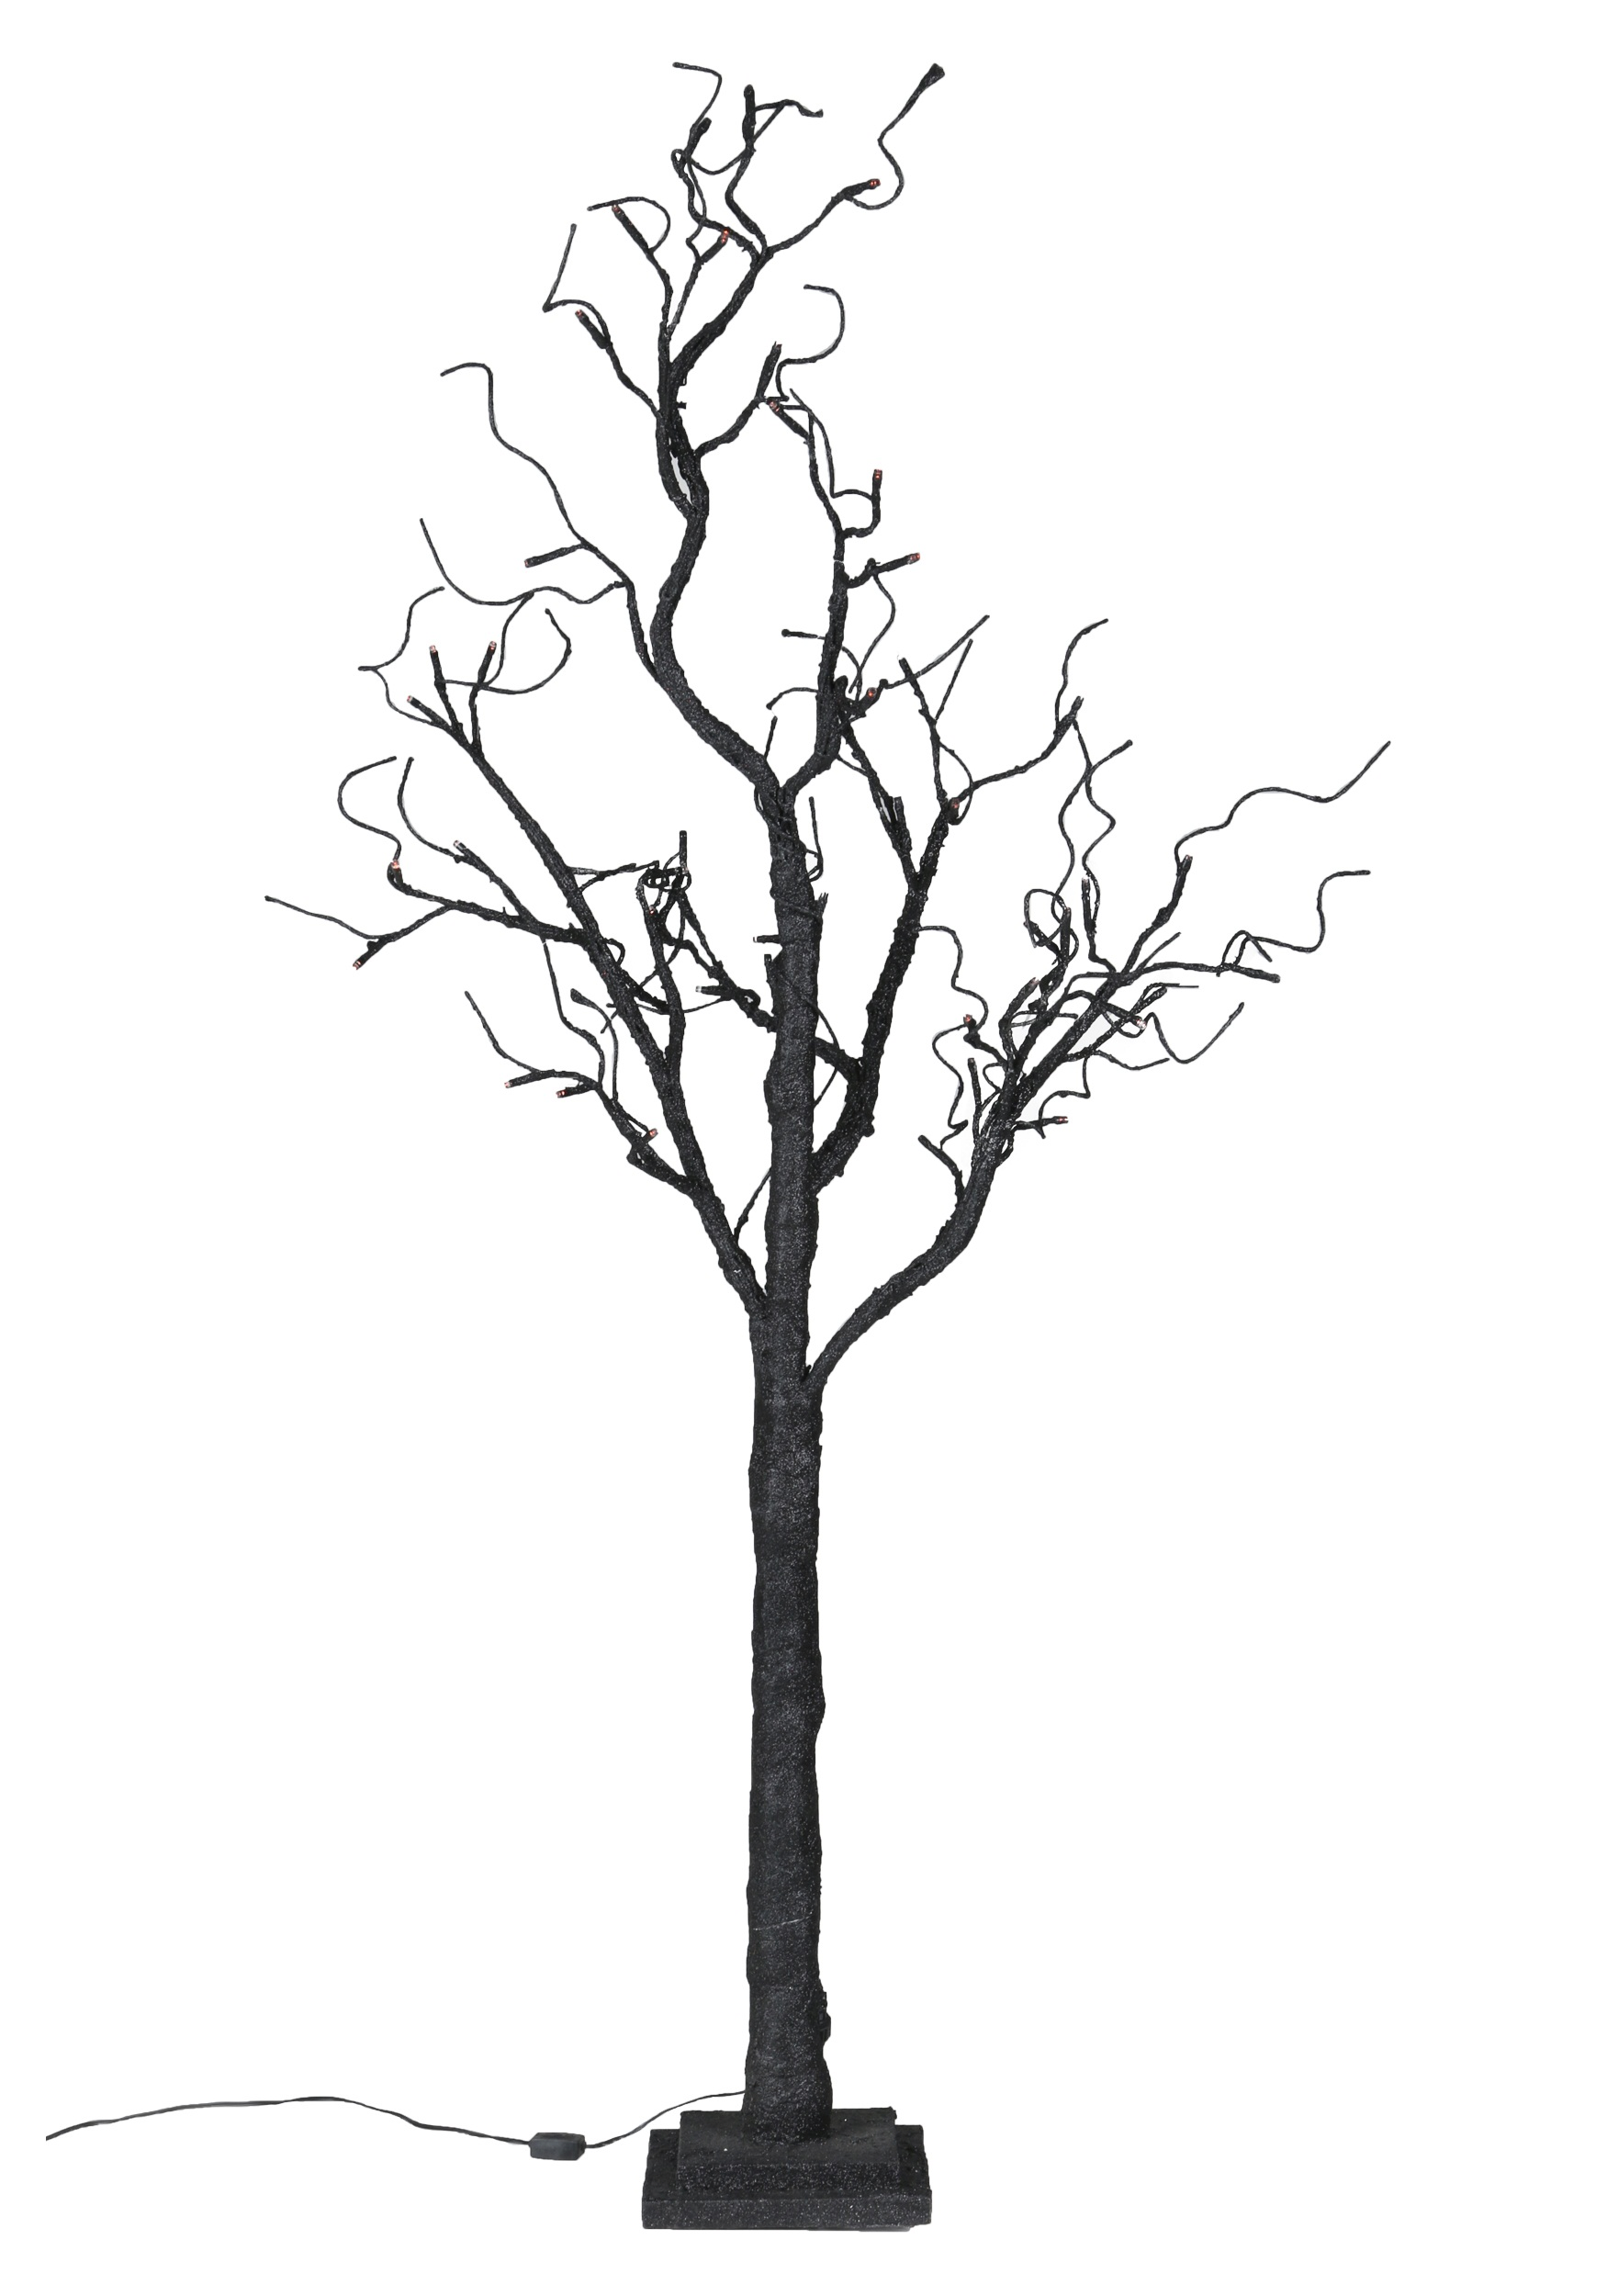 51 Twig Tree With Orange Lights